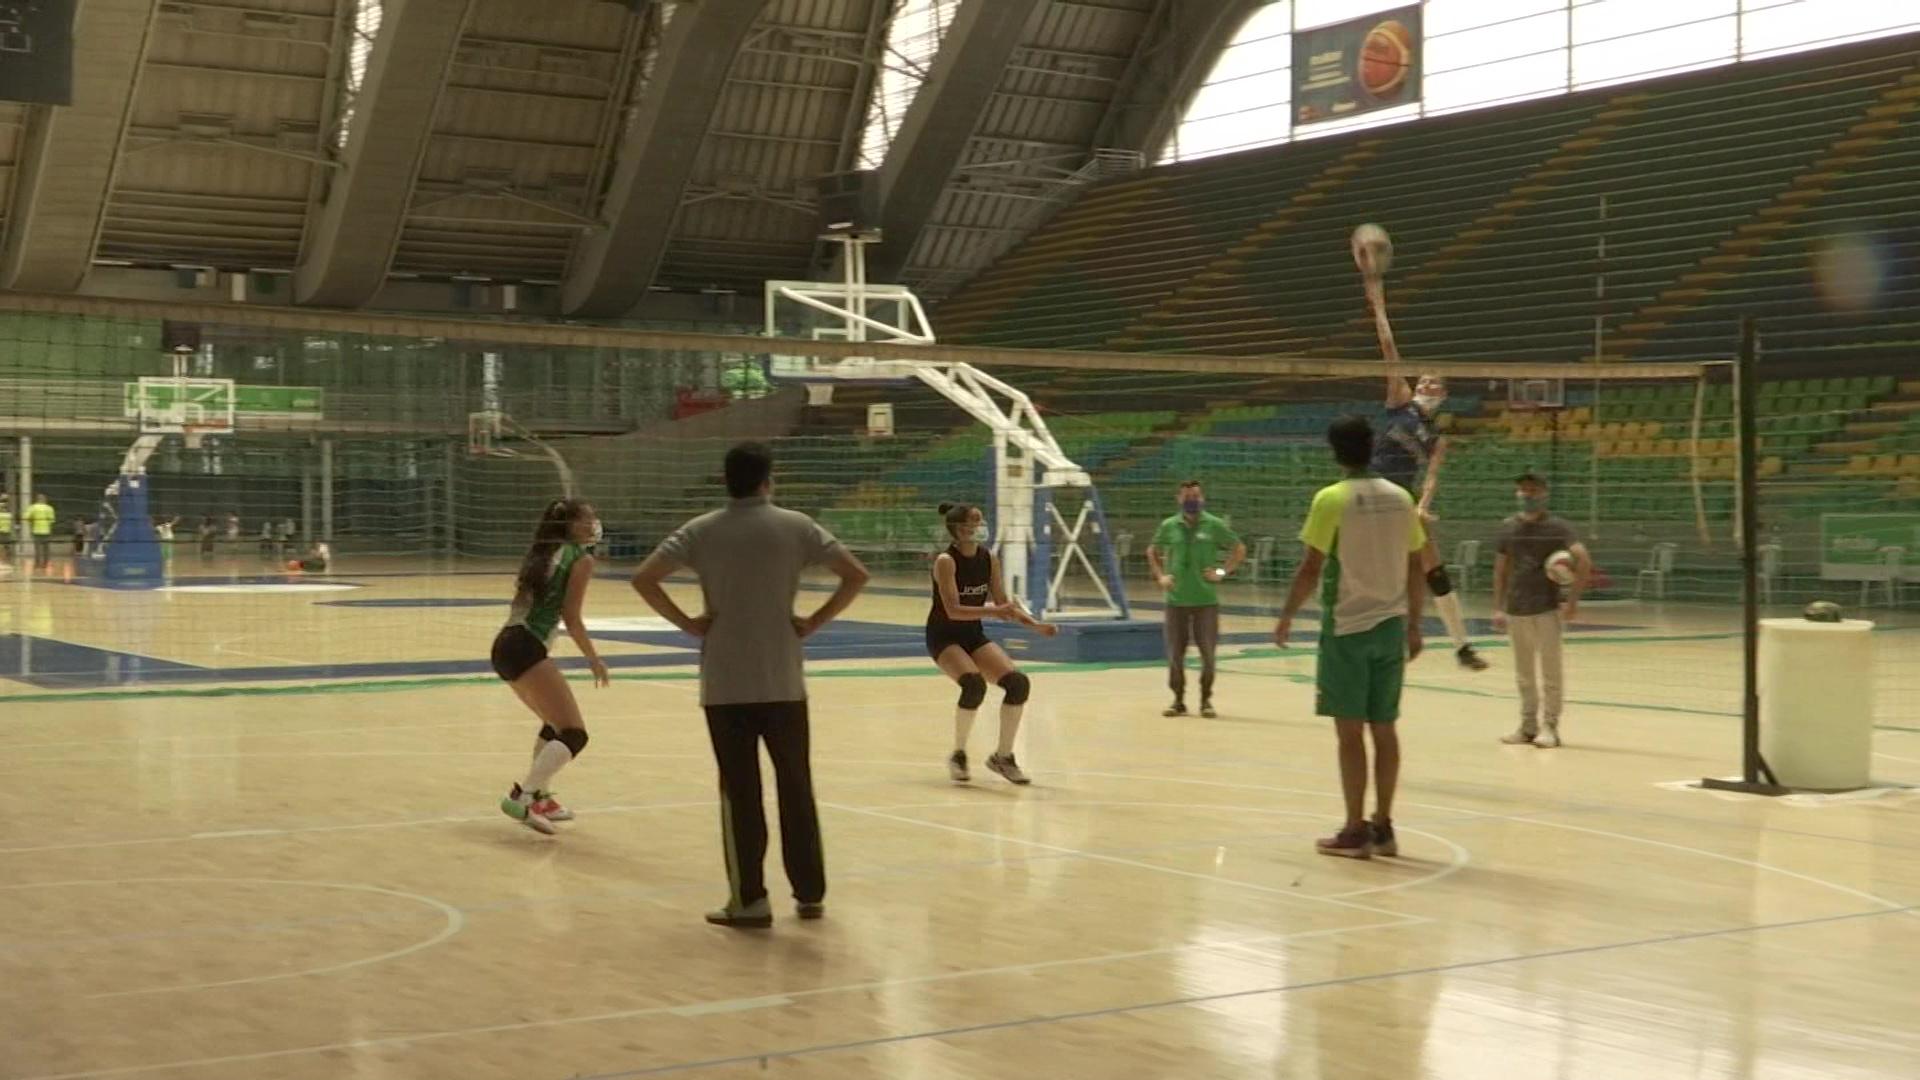 Voleibol busca escenario para entrenar